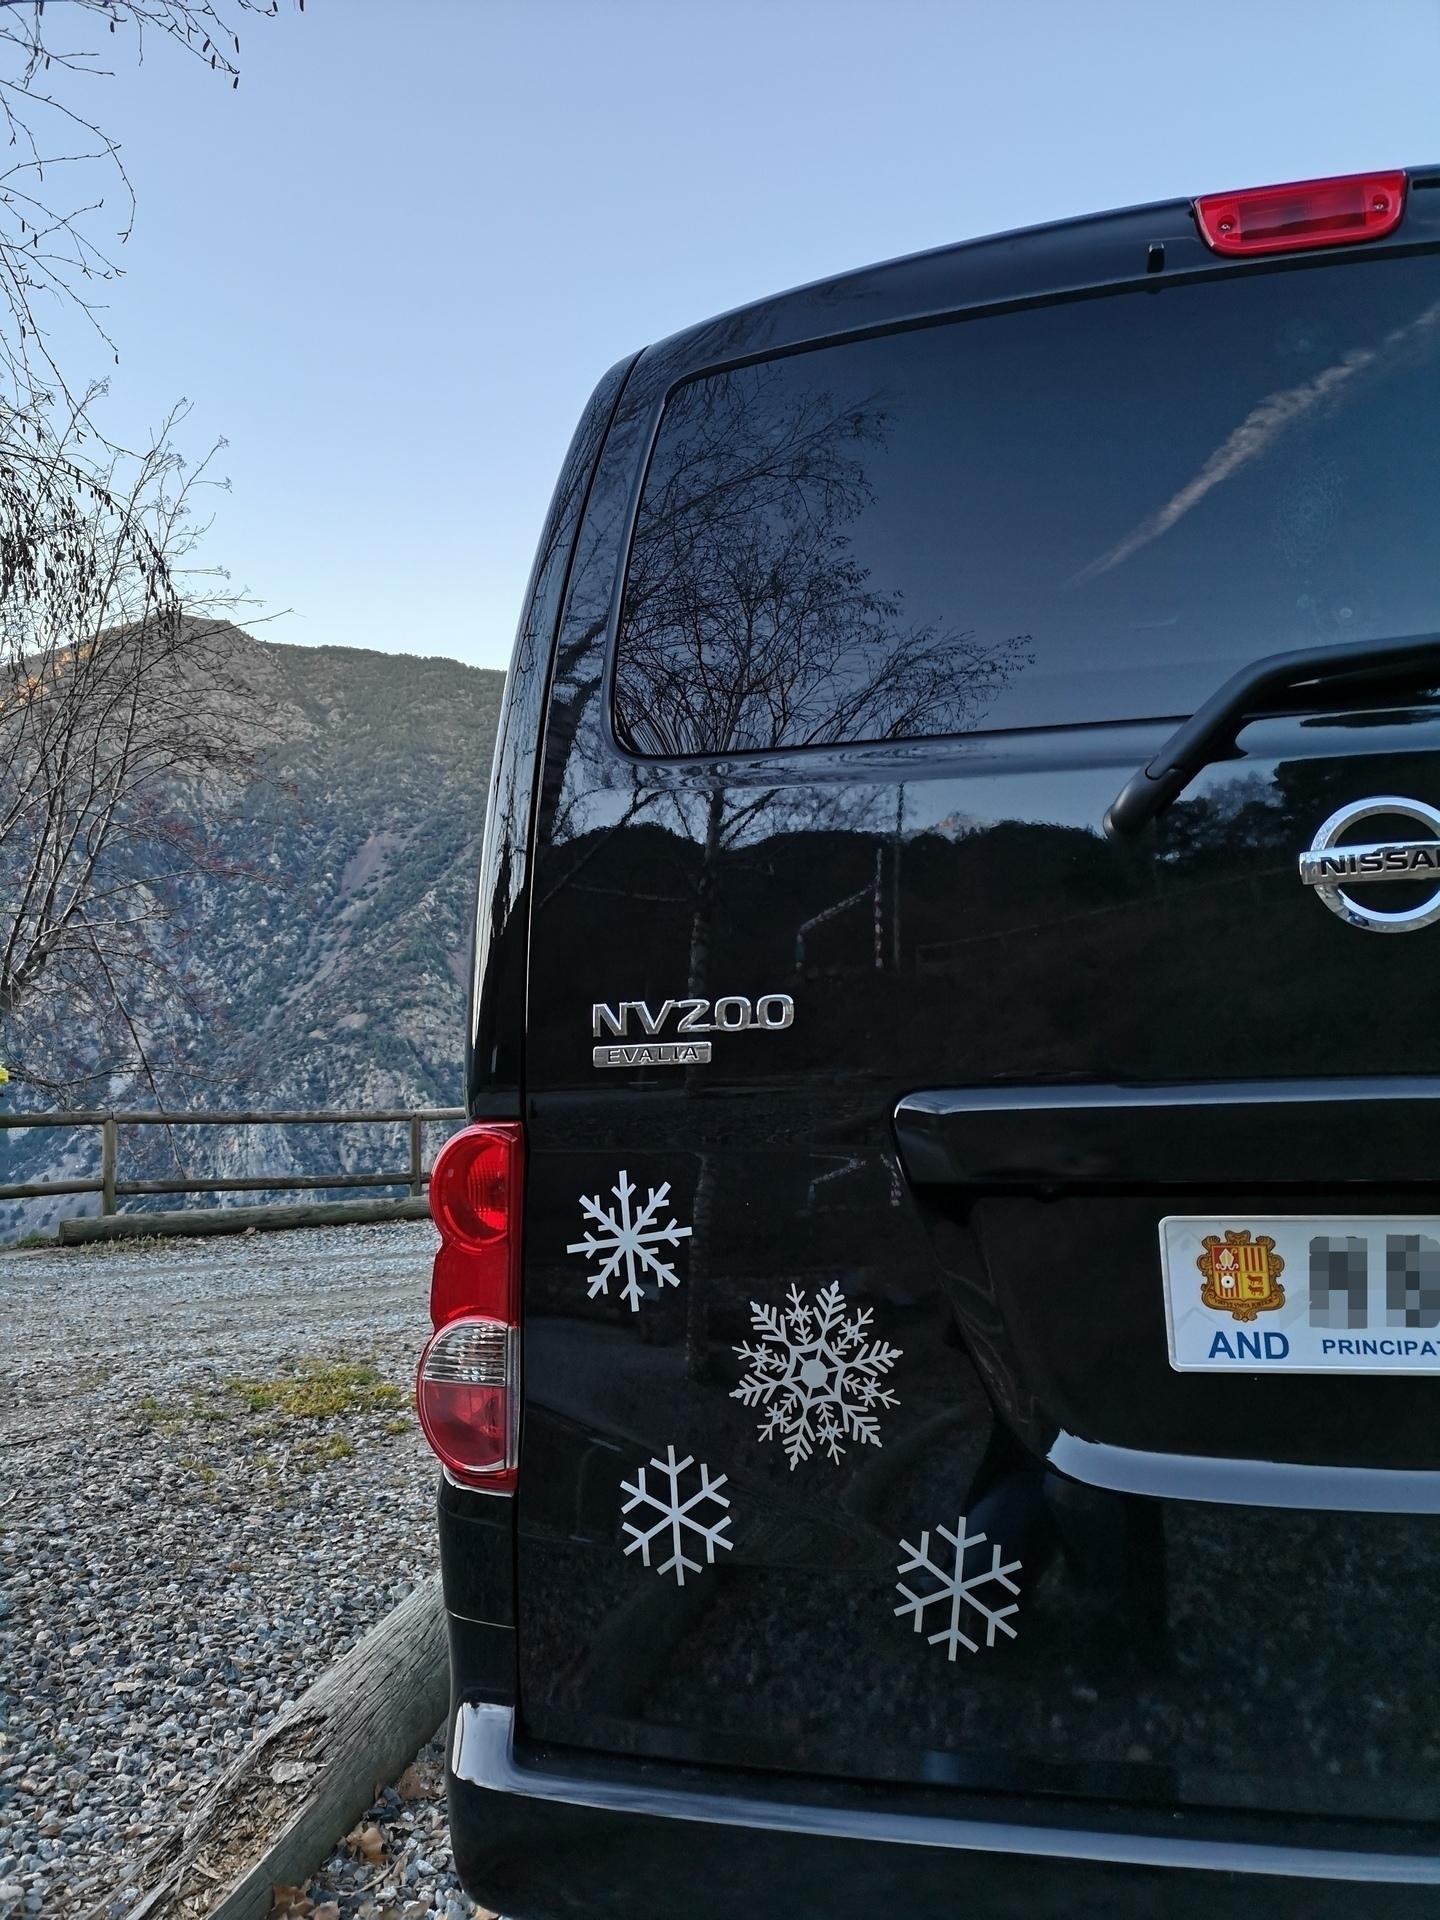 Silvia's photograph of their Festive Snowflake Sticker